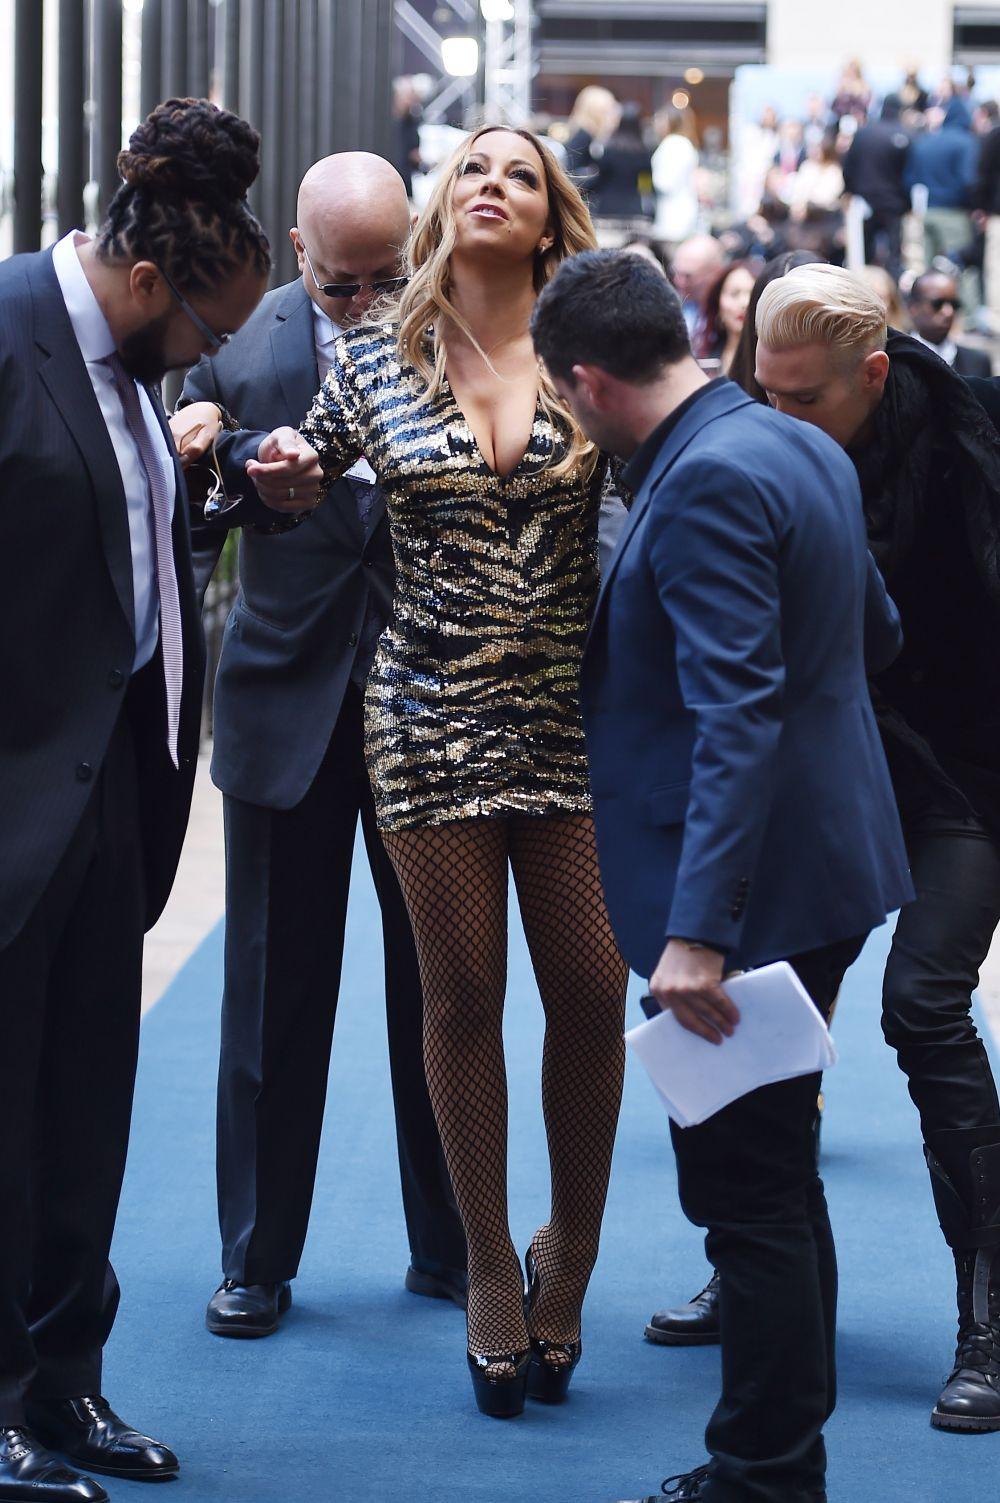 Paparazzi Mariah Carey nudes (32 photo), Sexy, Paparazzi, Boobs, in bikini 2006